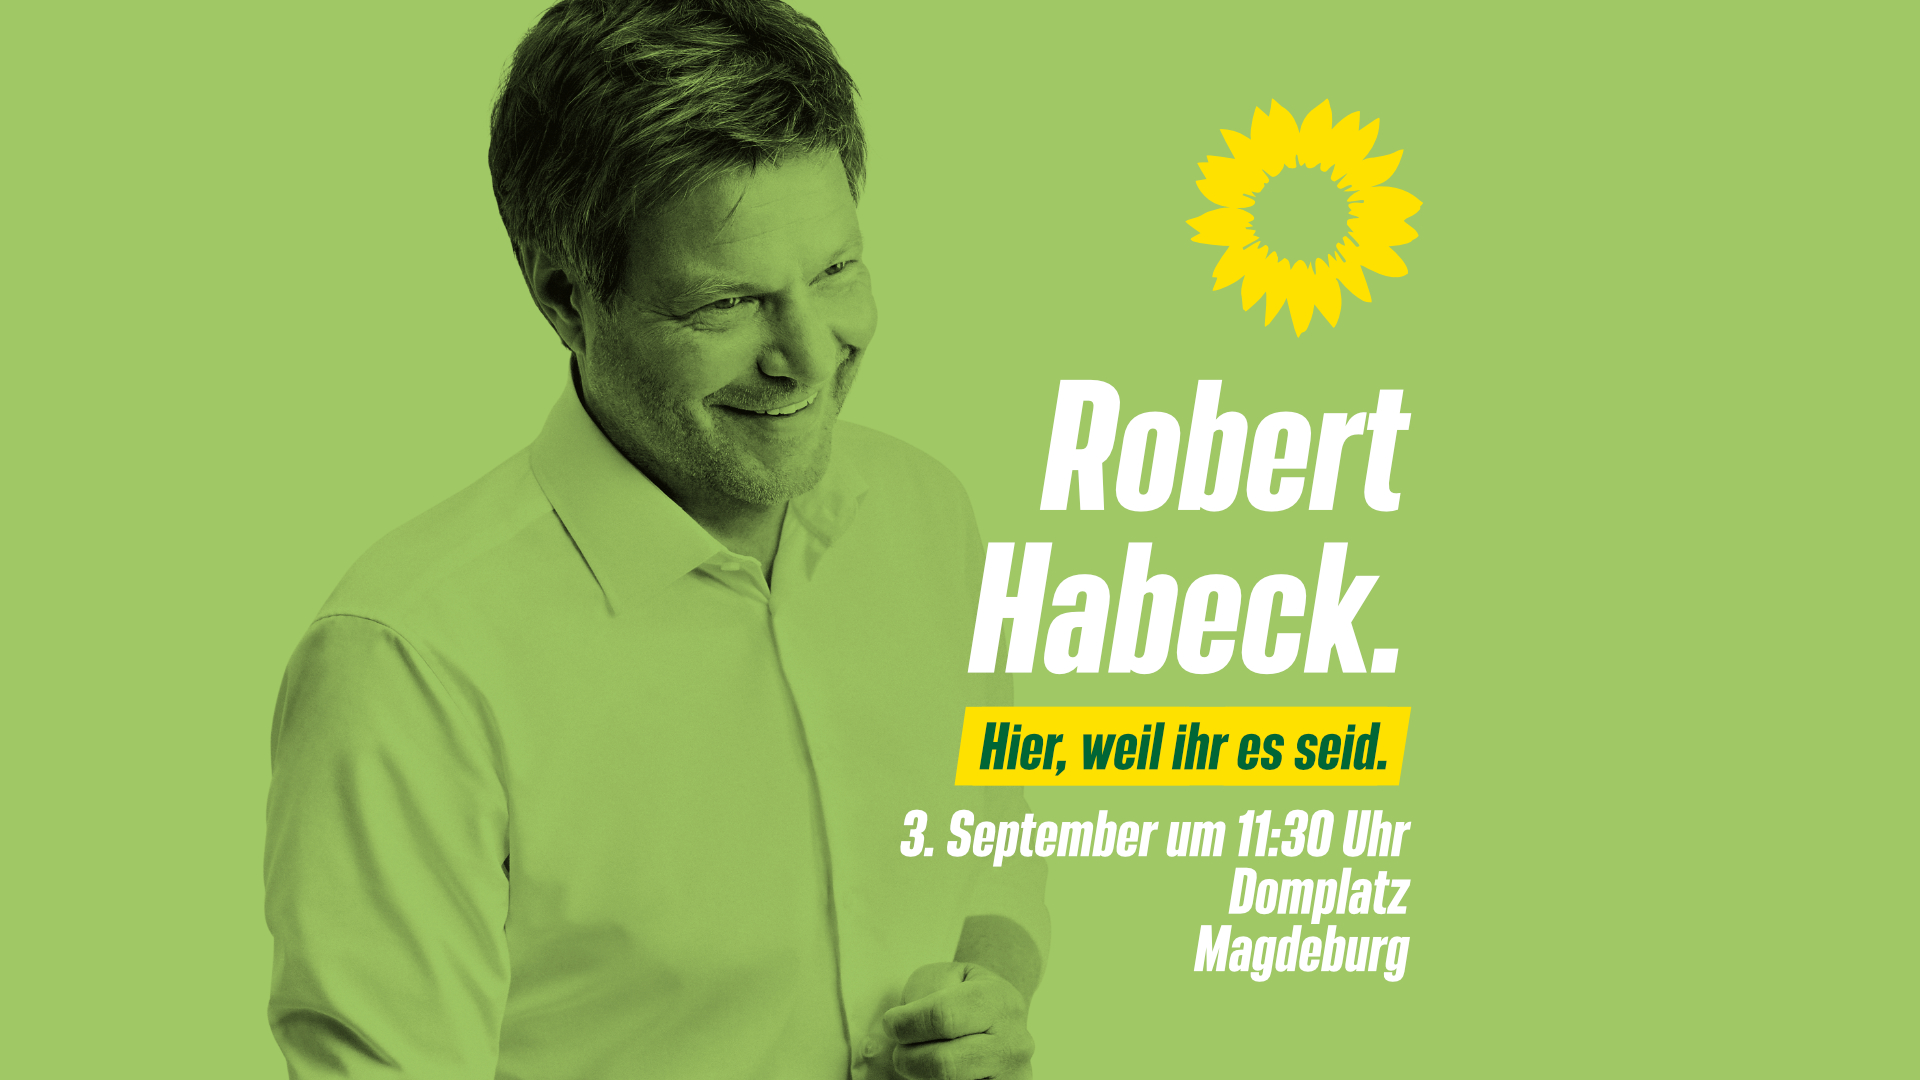 Robert Habeck in Magdeburg